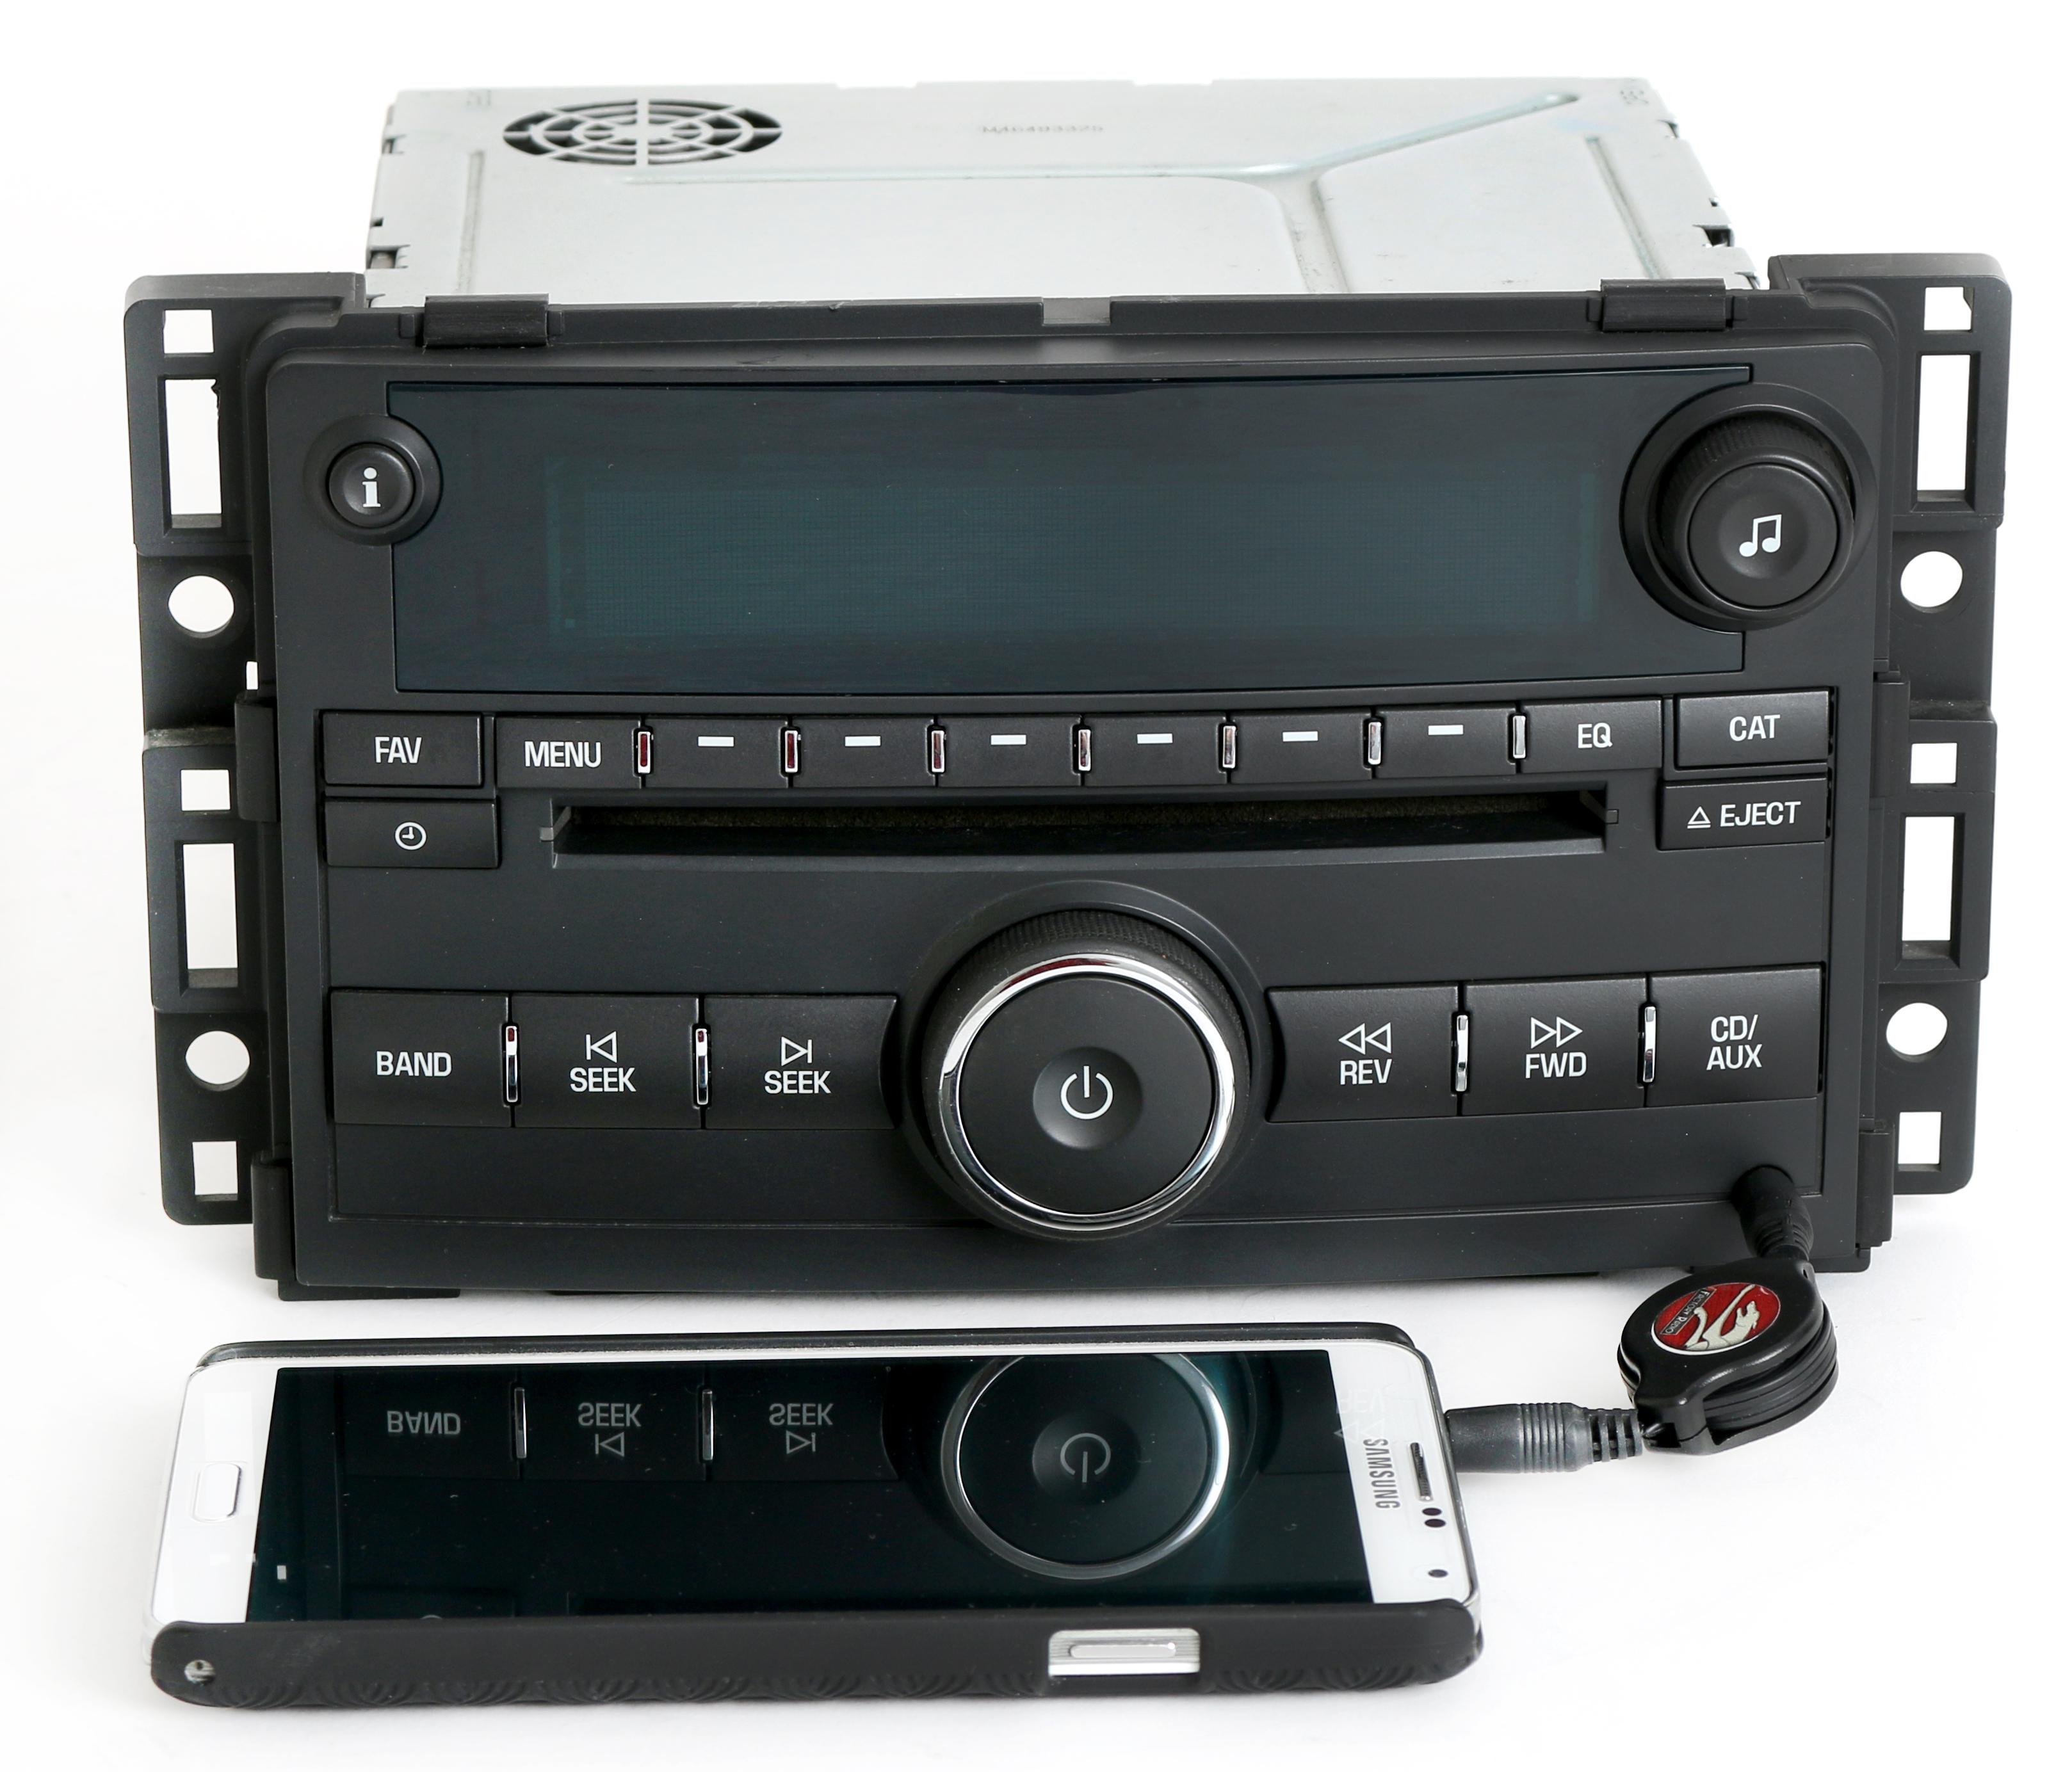 Pontiac G5 & Chevy Cobalt 2007-2008 AM FM CD Aux Input Radio - GM Part  22714657 - 1 Factory Radio